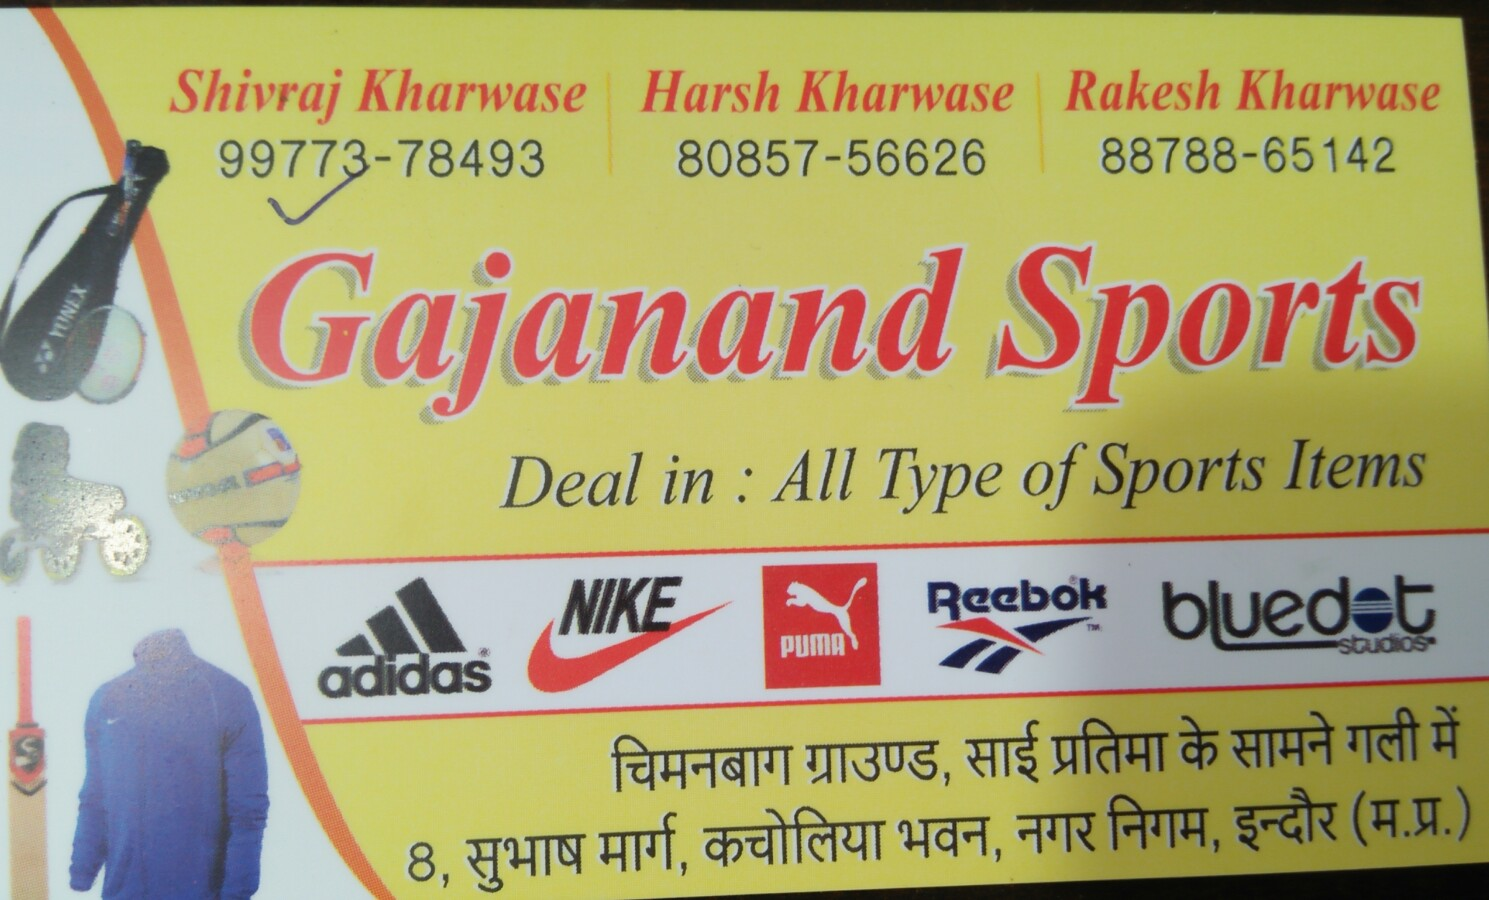 Gajanand sports